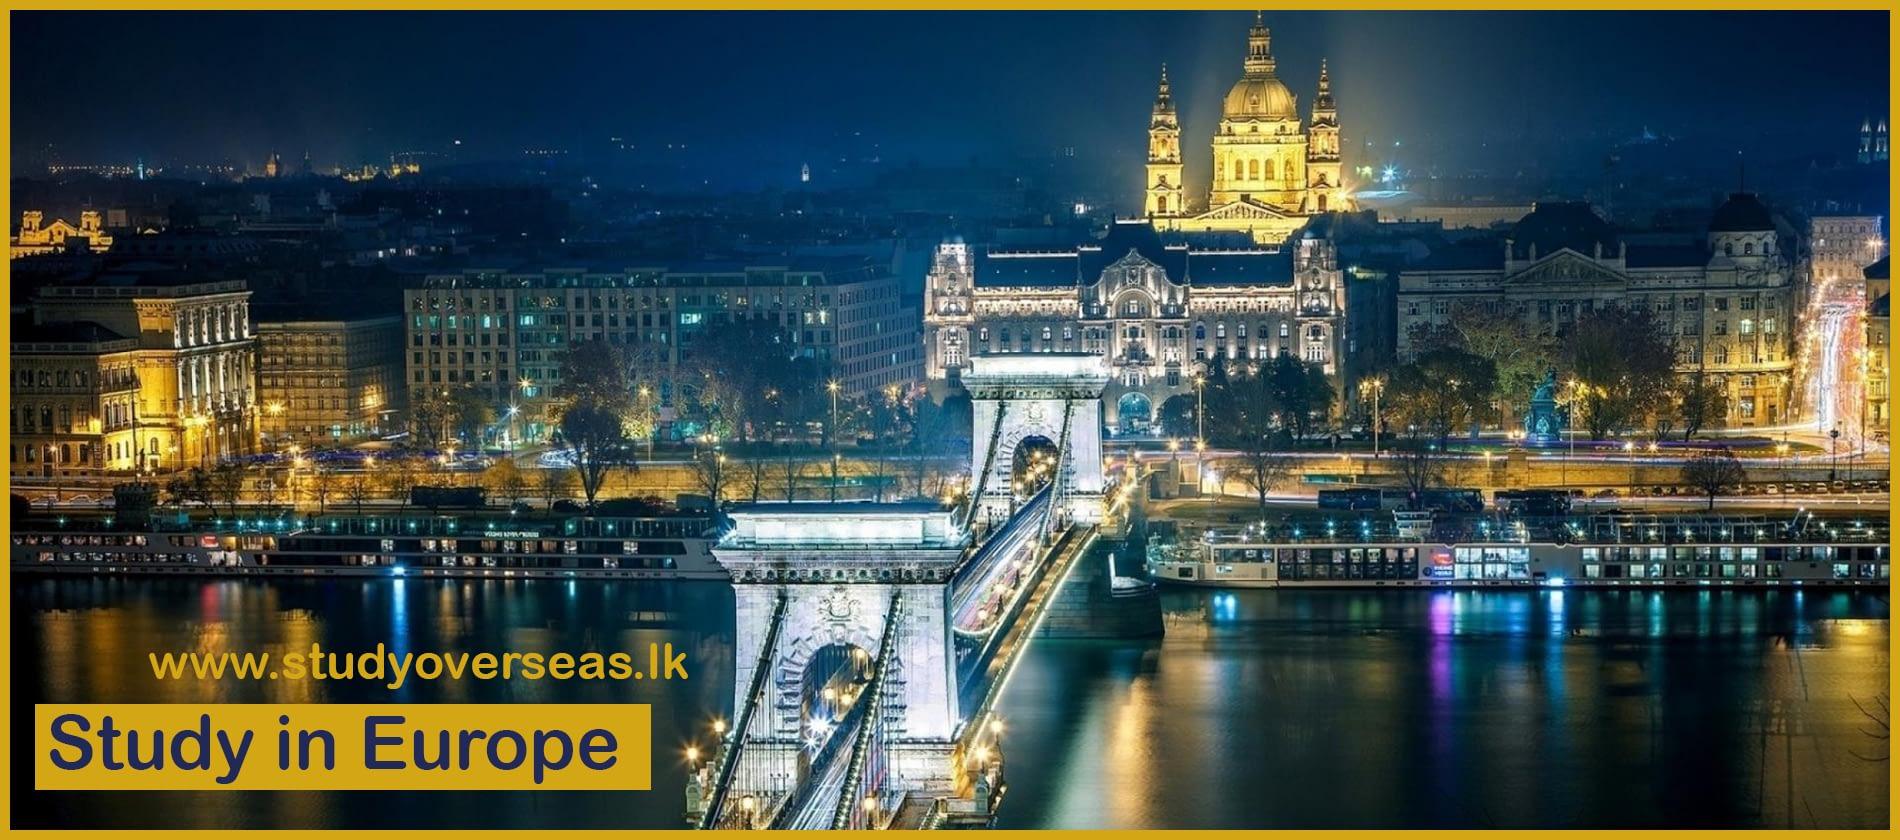 study_in_europe_budapest_www.studyoverseas.lk